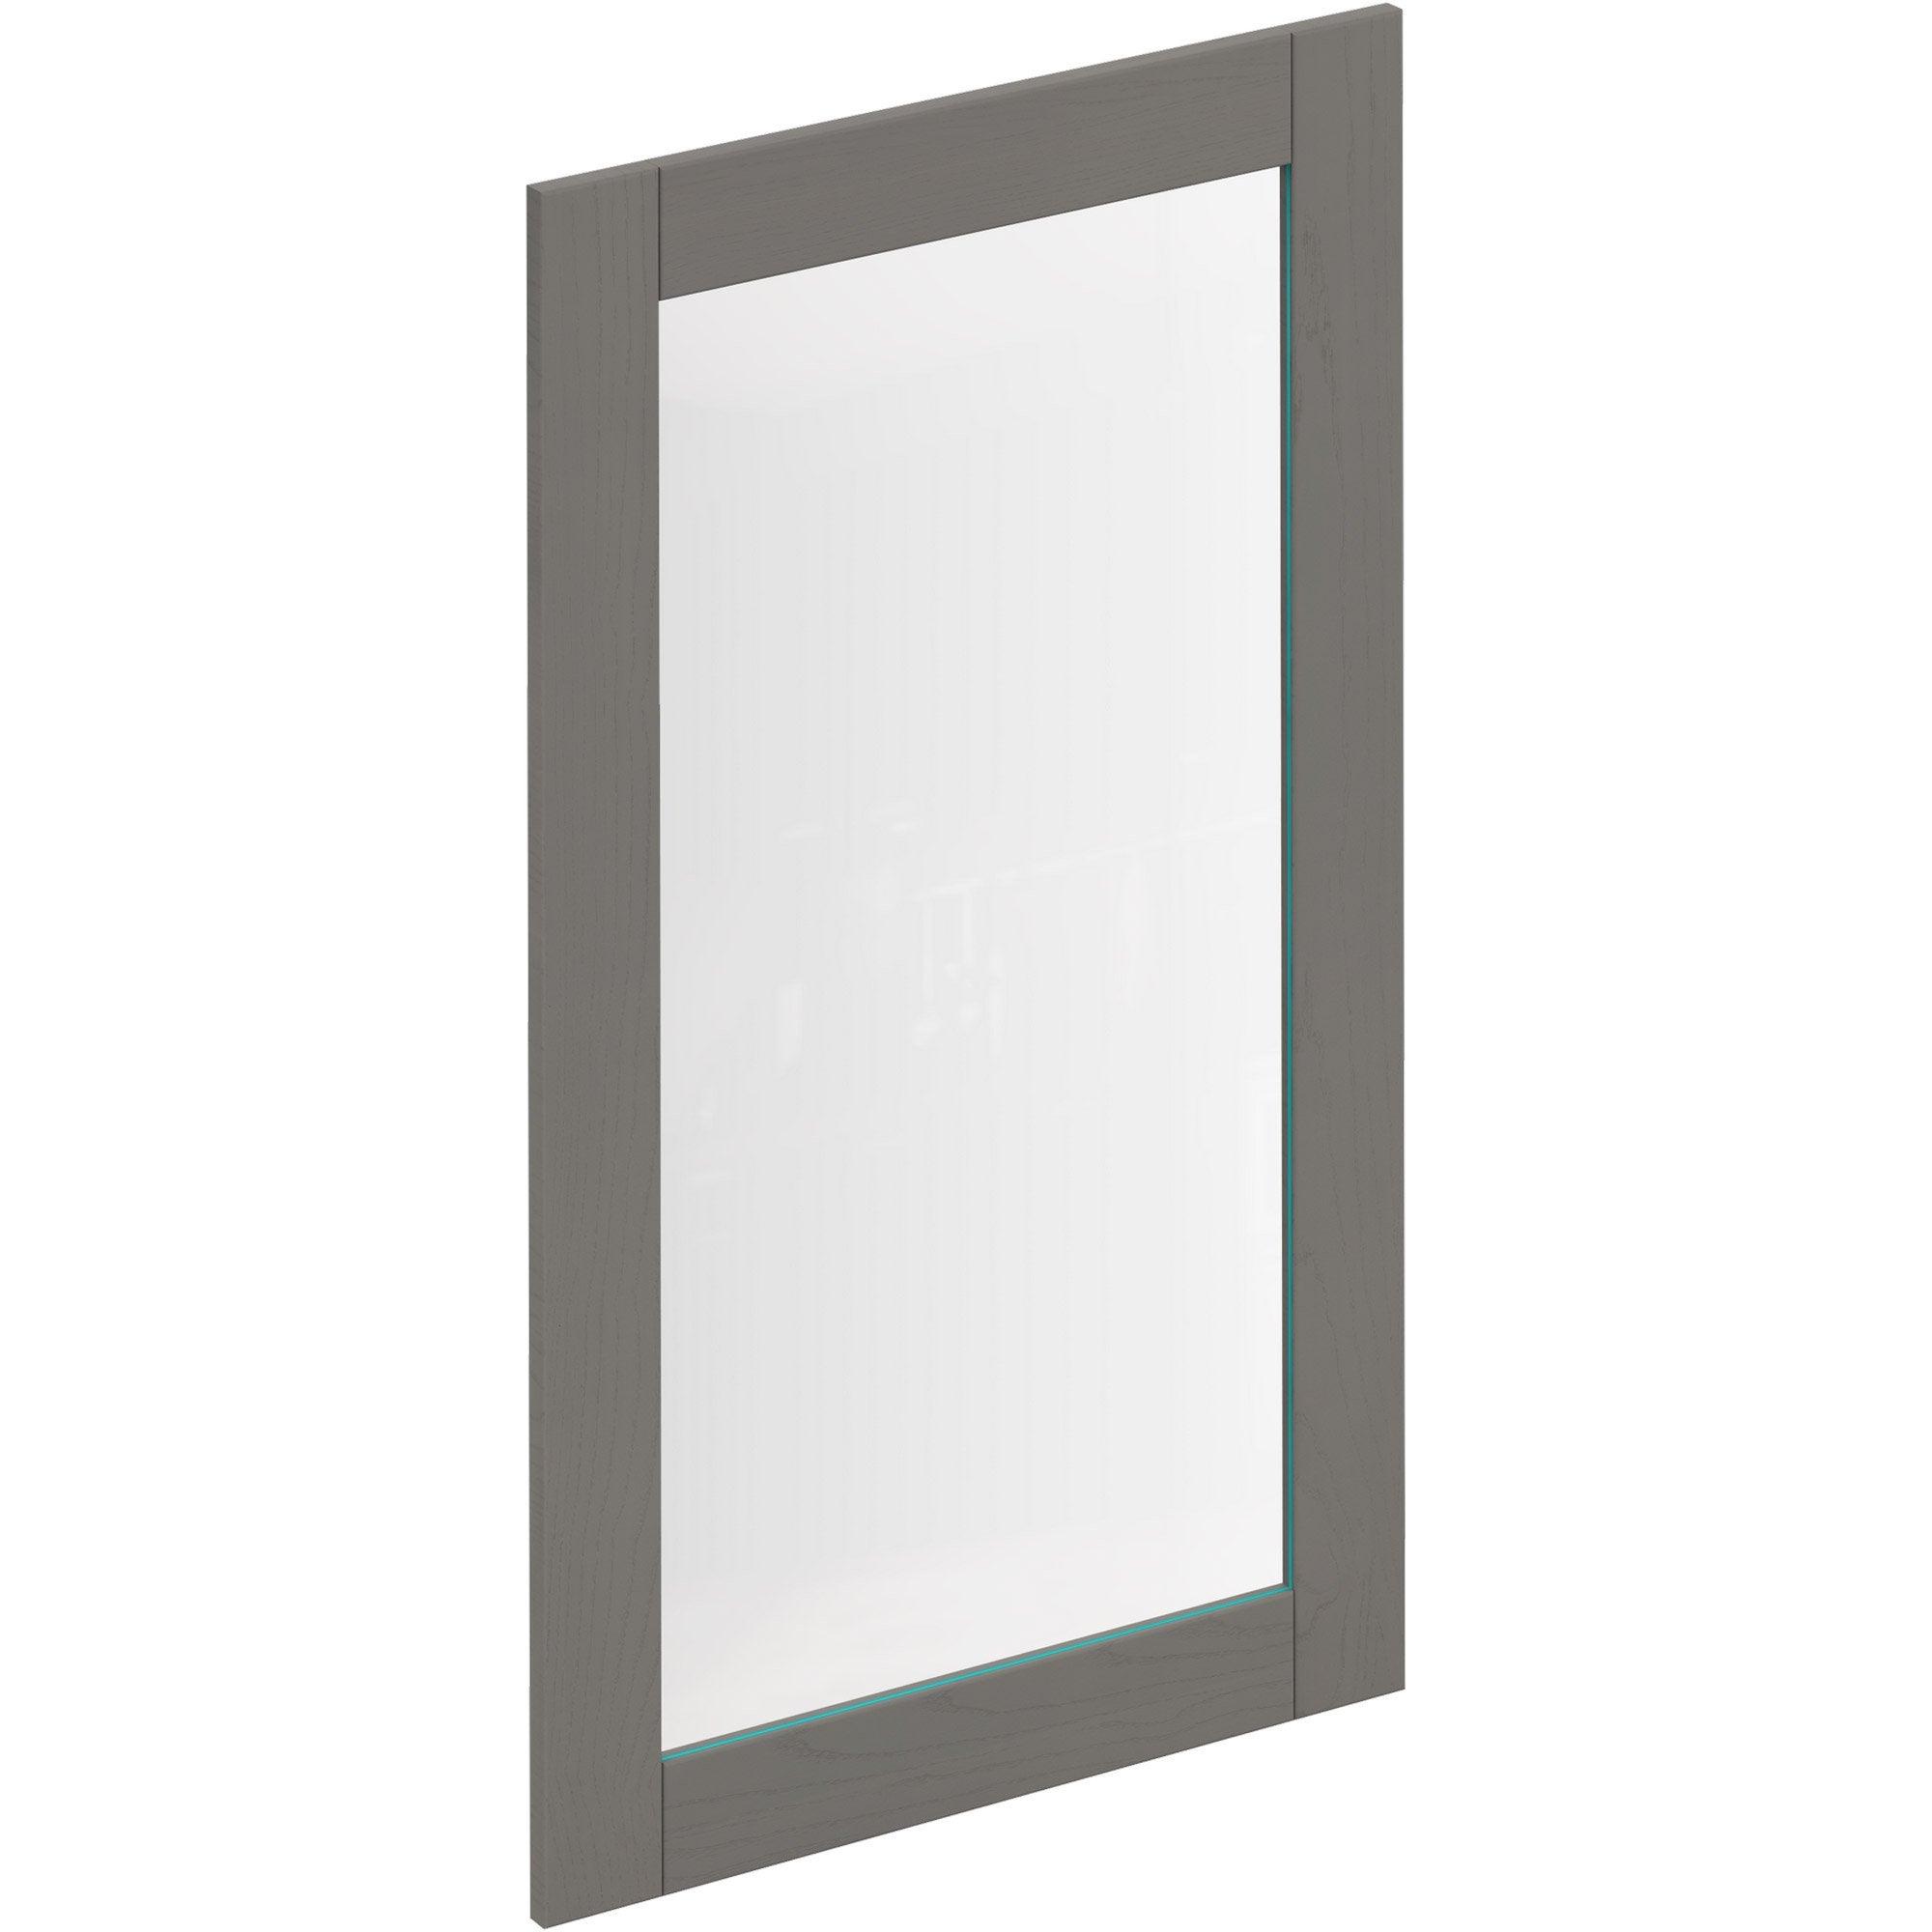 Porte de cuisine vitr e boston gris delinia id x cm leroy merlin - Porte de cuisine vitree ...